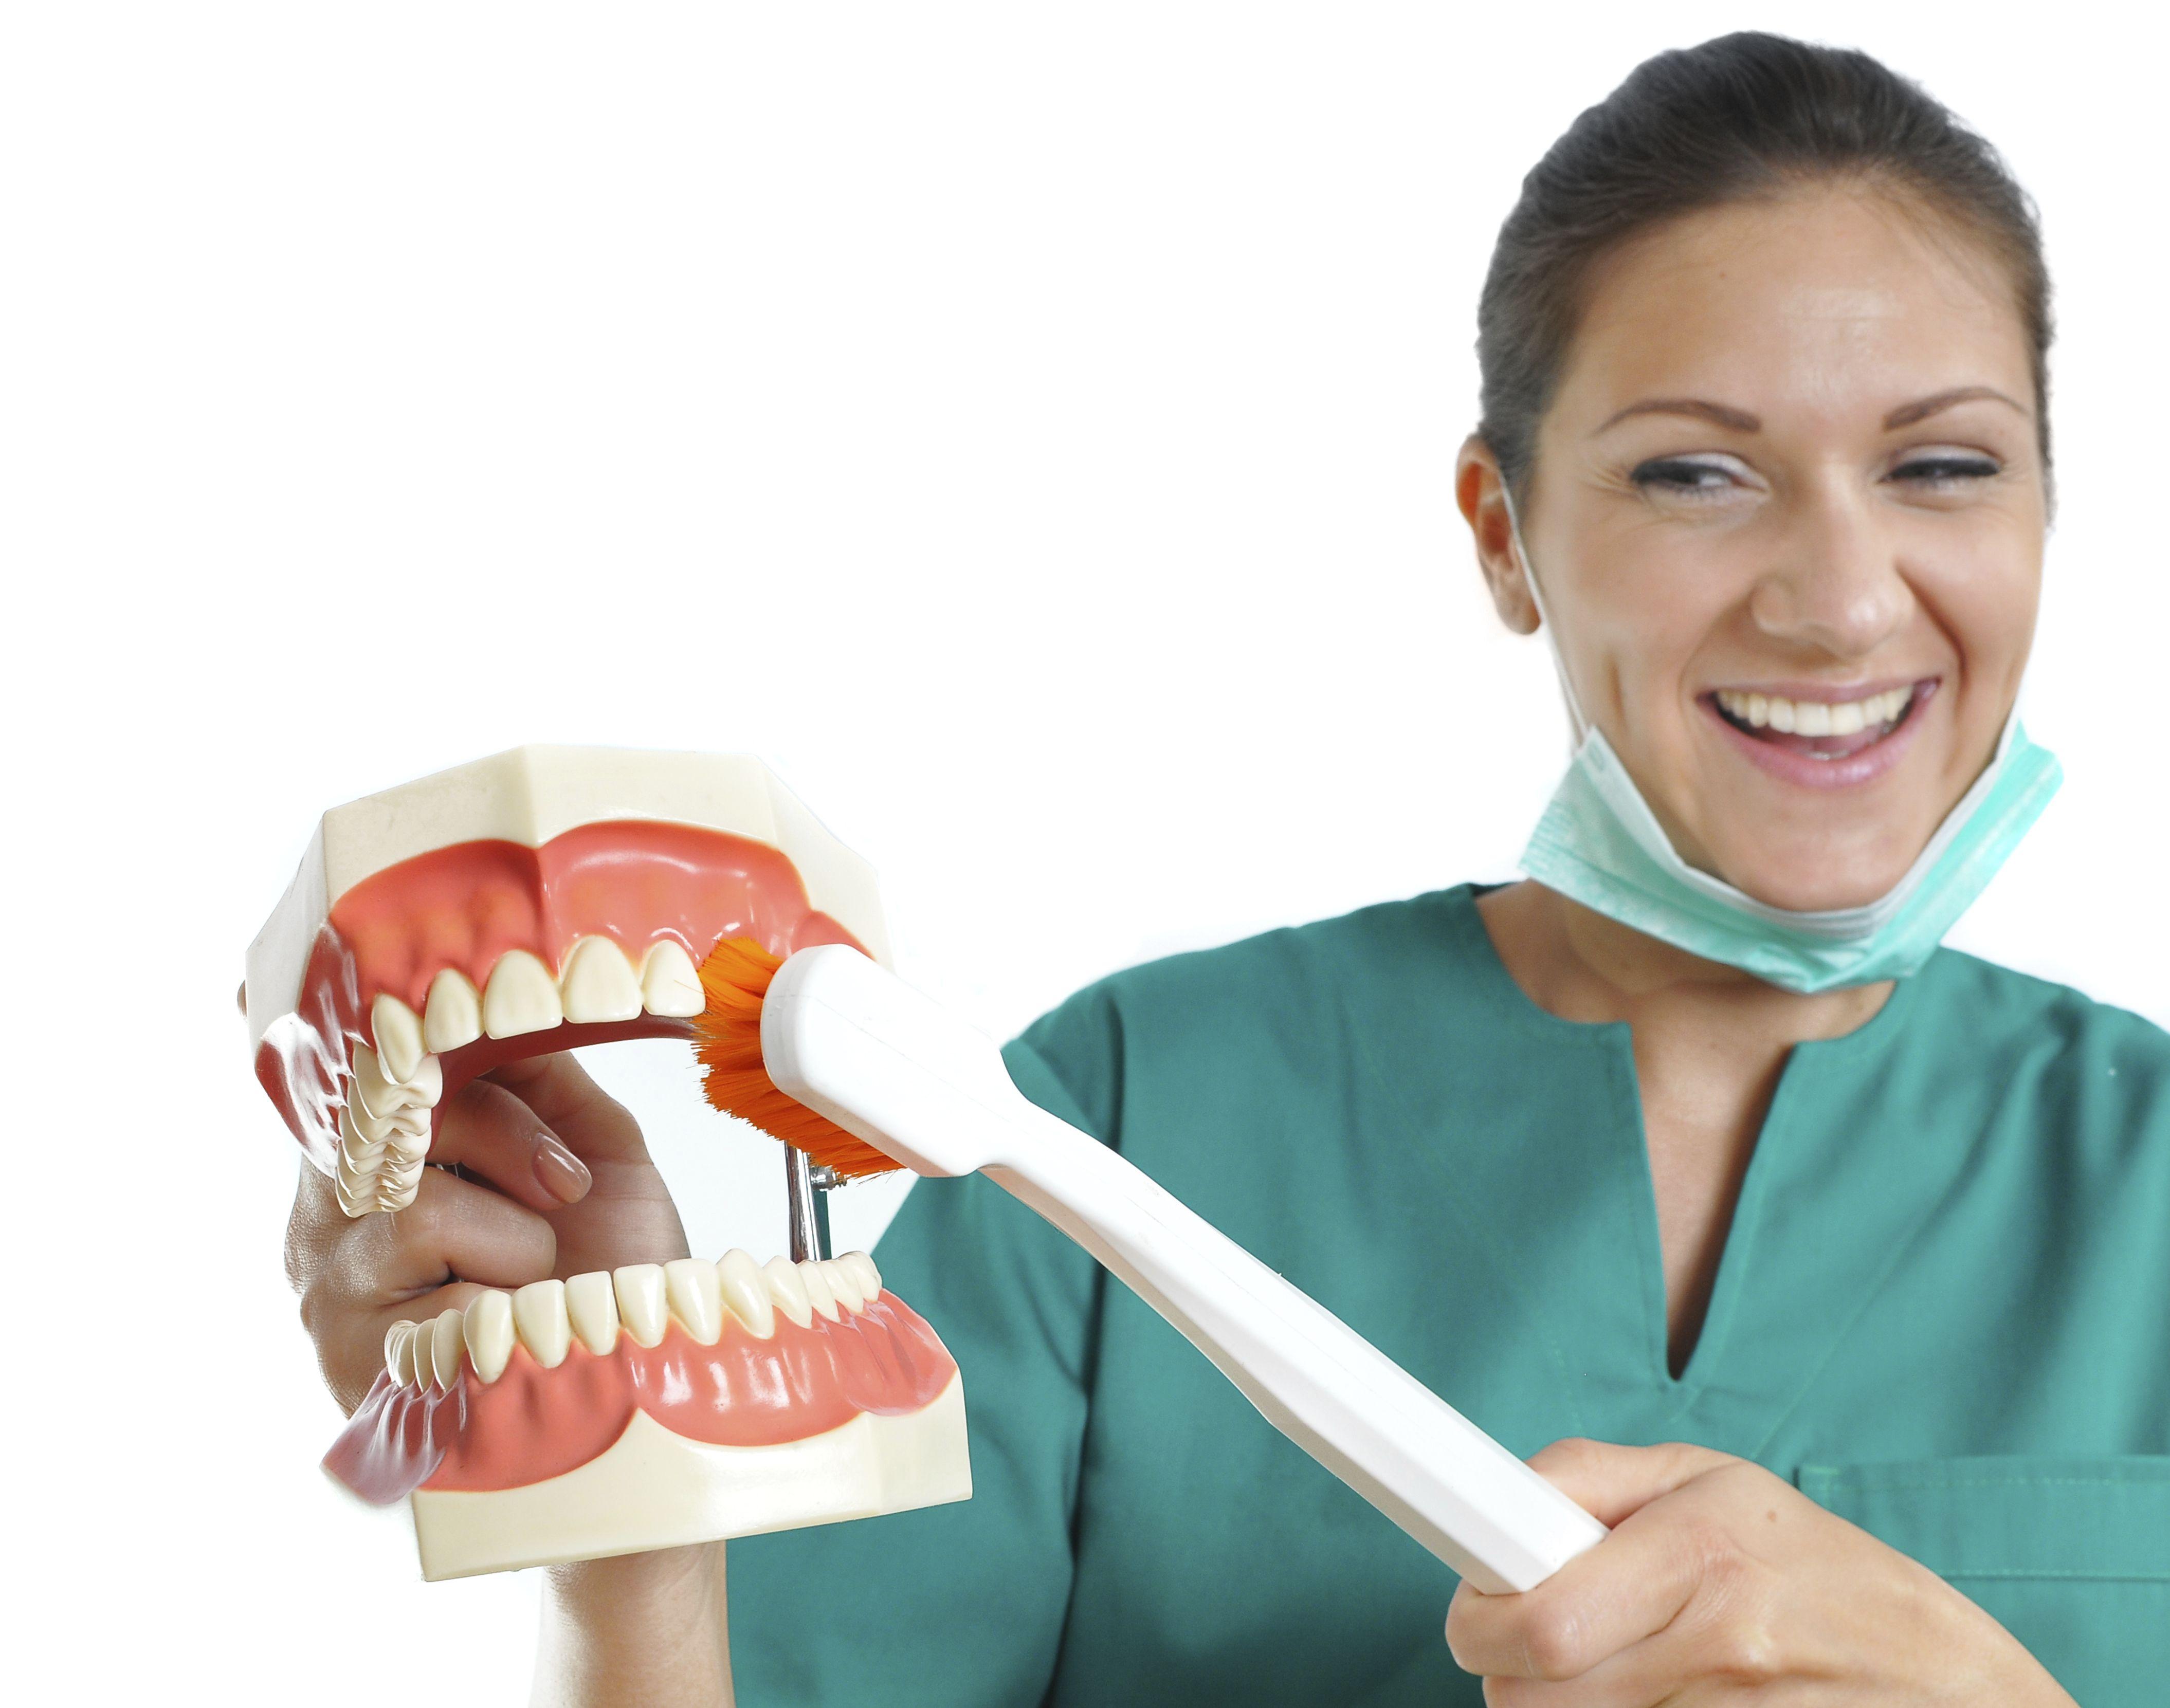 Asesoramiento en higiene dental en Santa Cruz de Tenerife